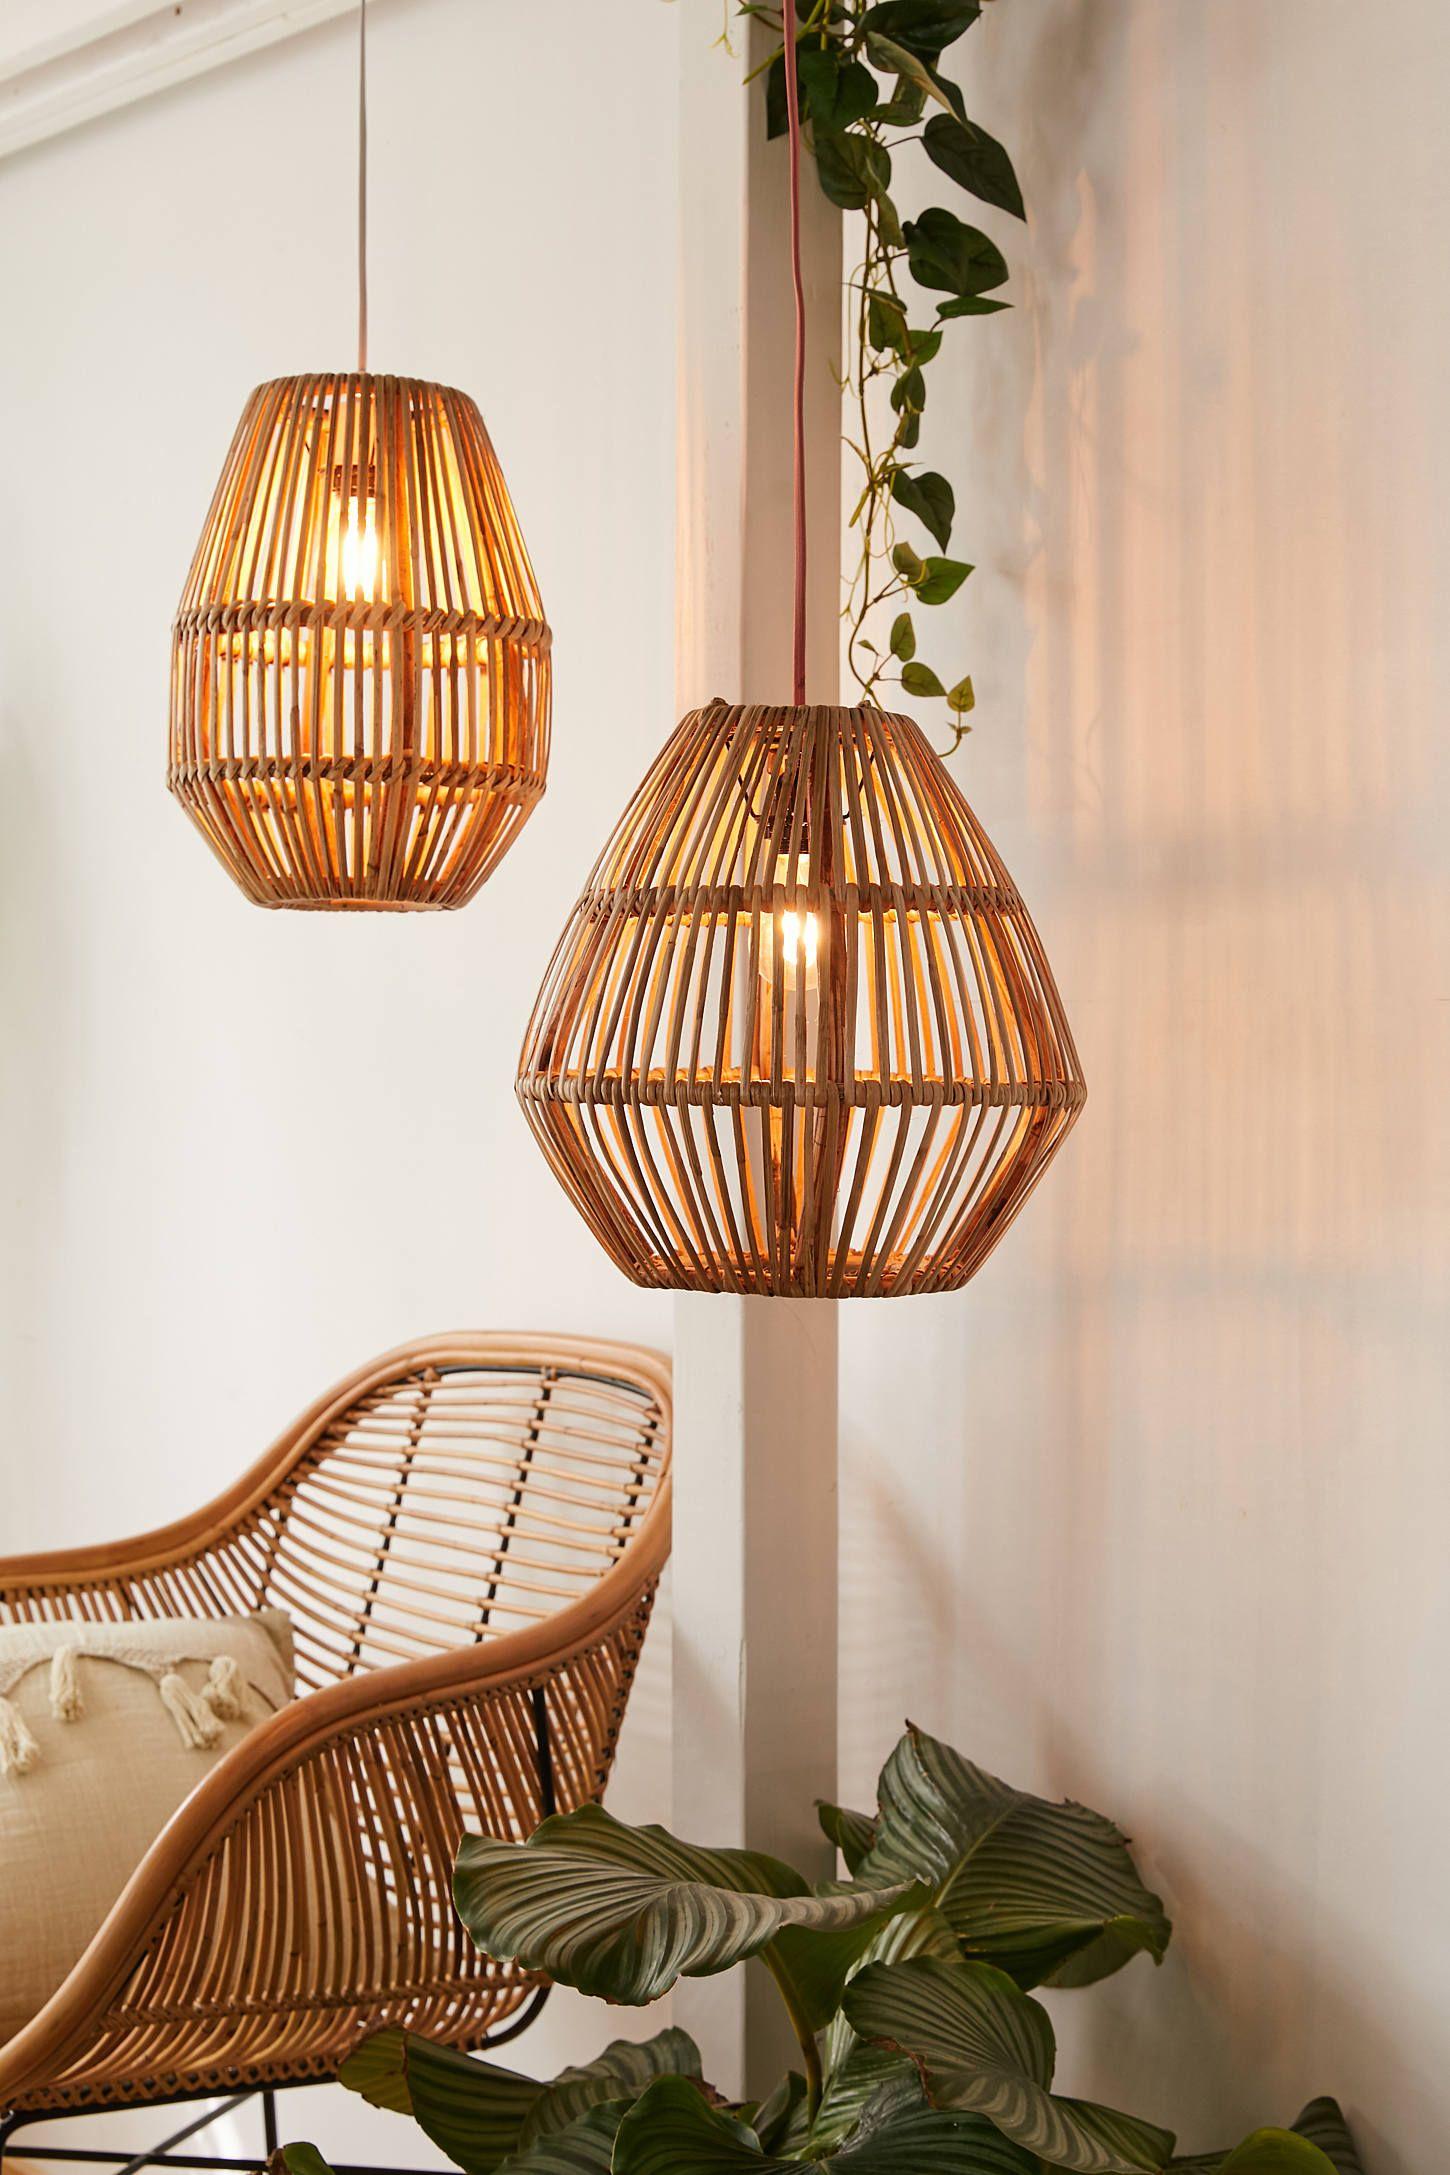 Bamboo woven pendant light shade trending decor home